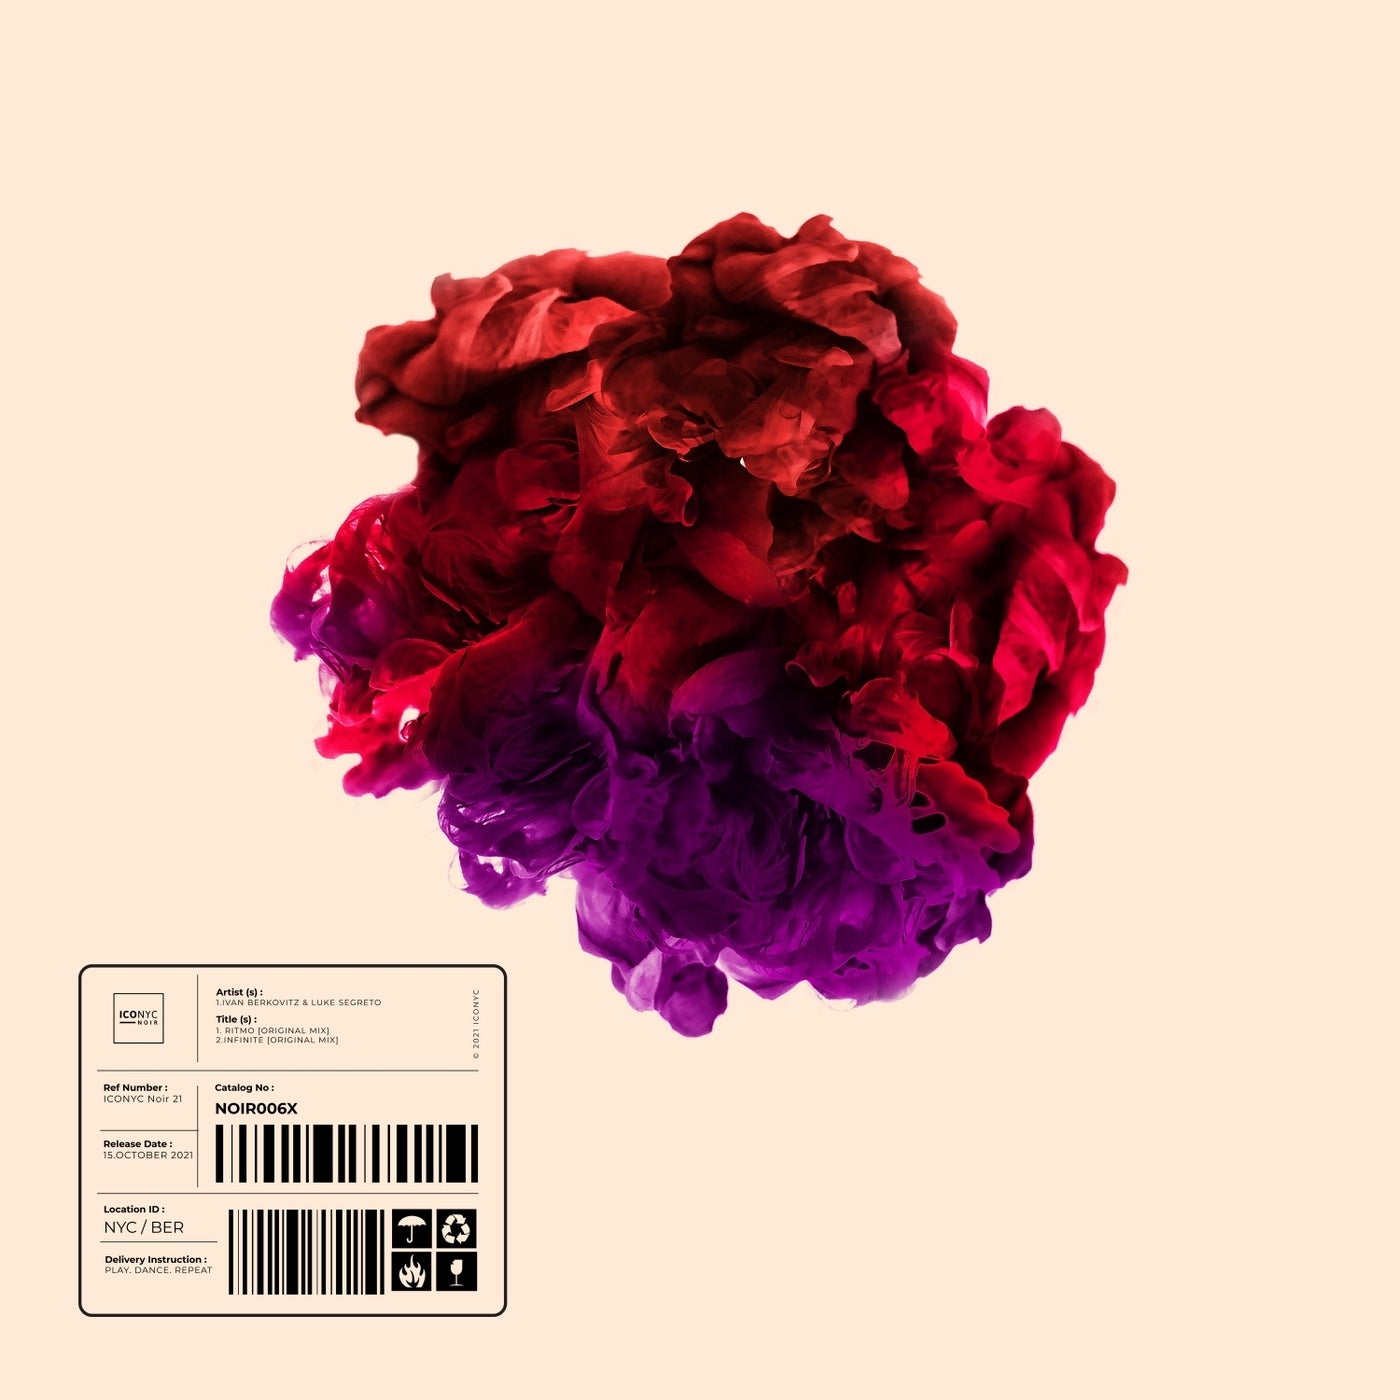 Ritmo (Original Mix)